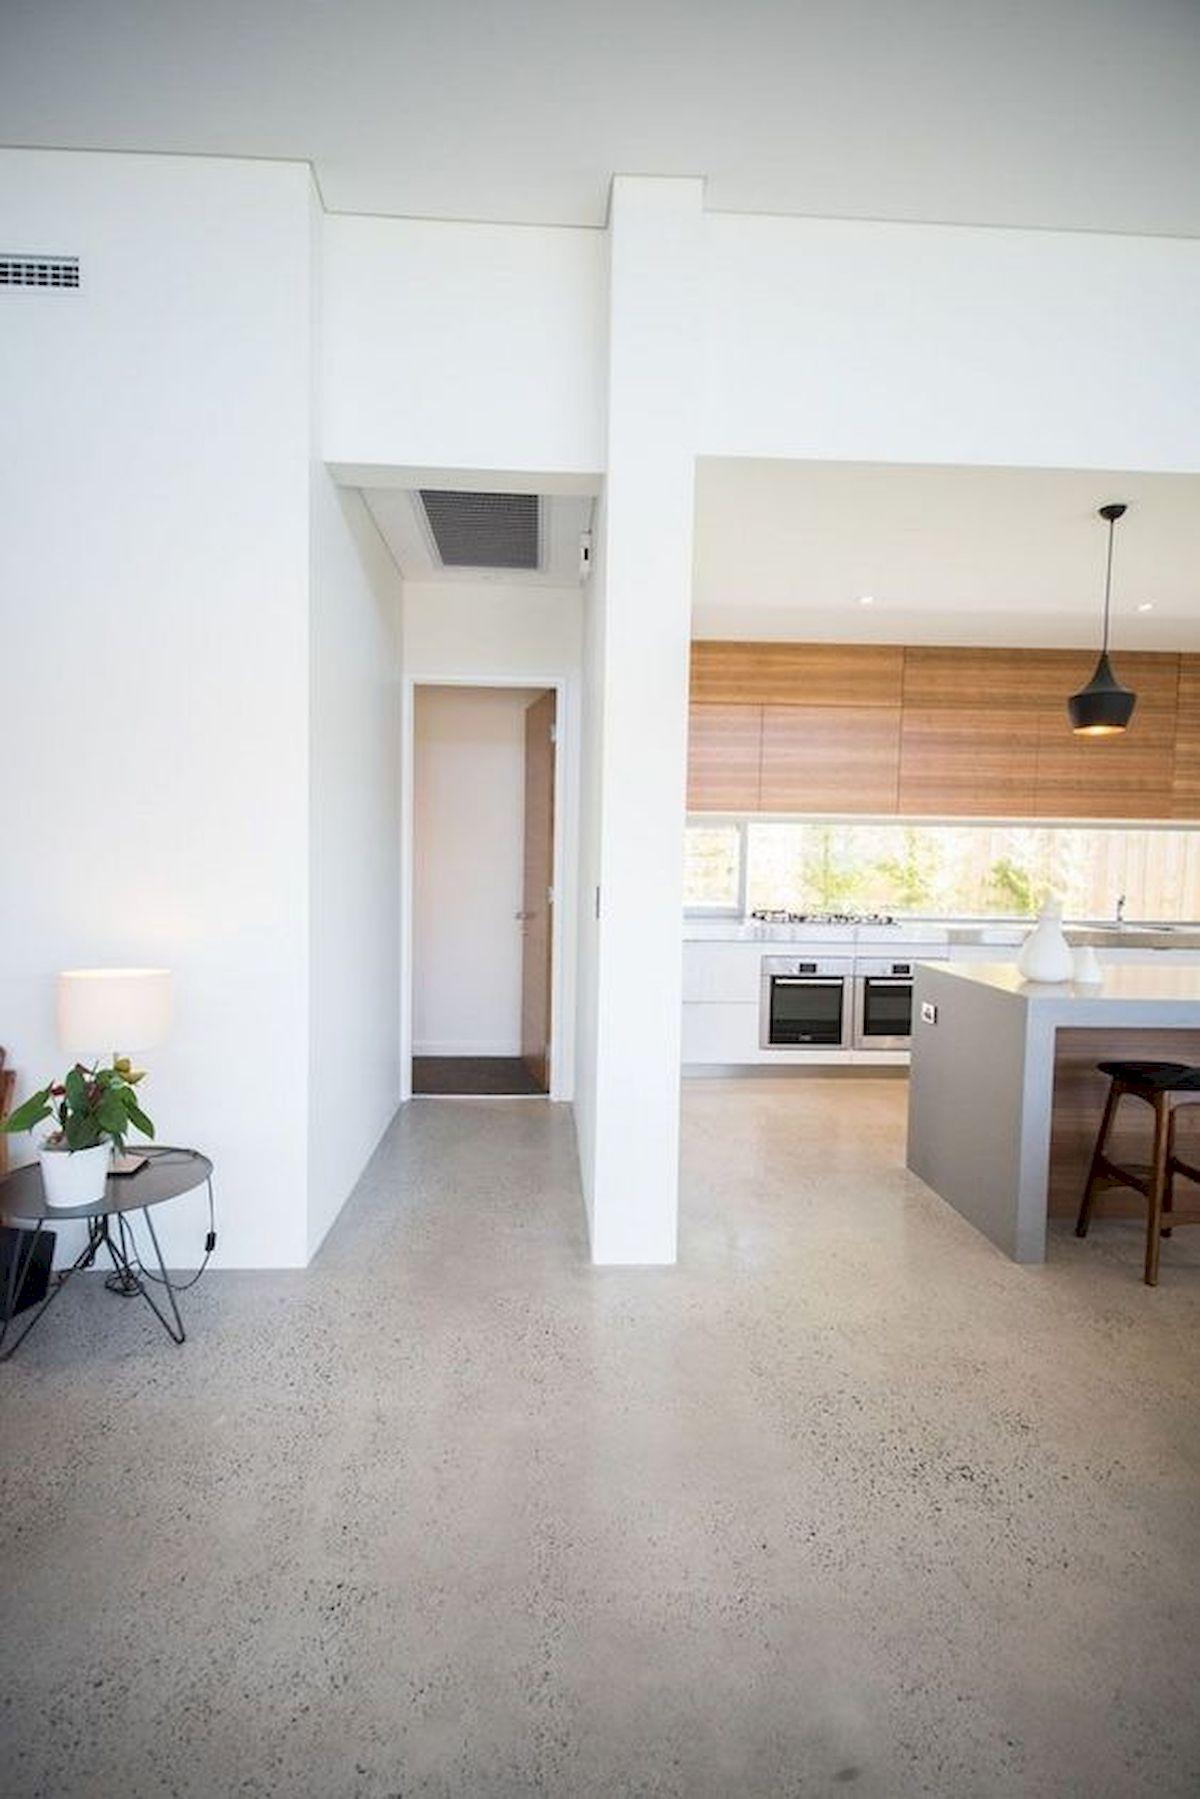 70 Smooth Concrete Floor Ideas for Interior Home 37 ...